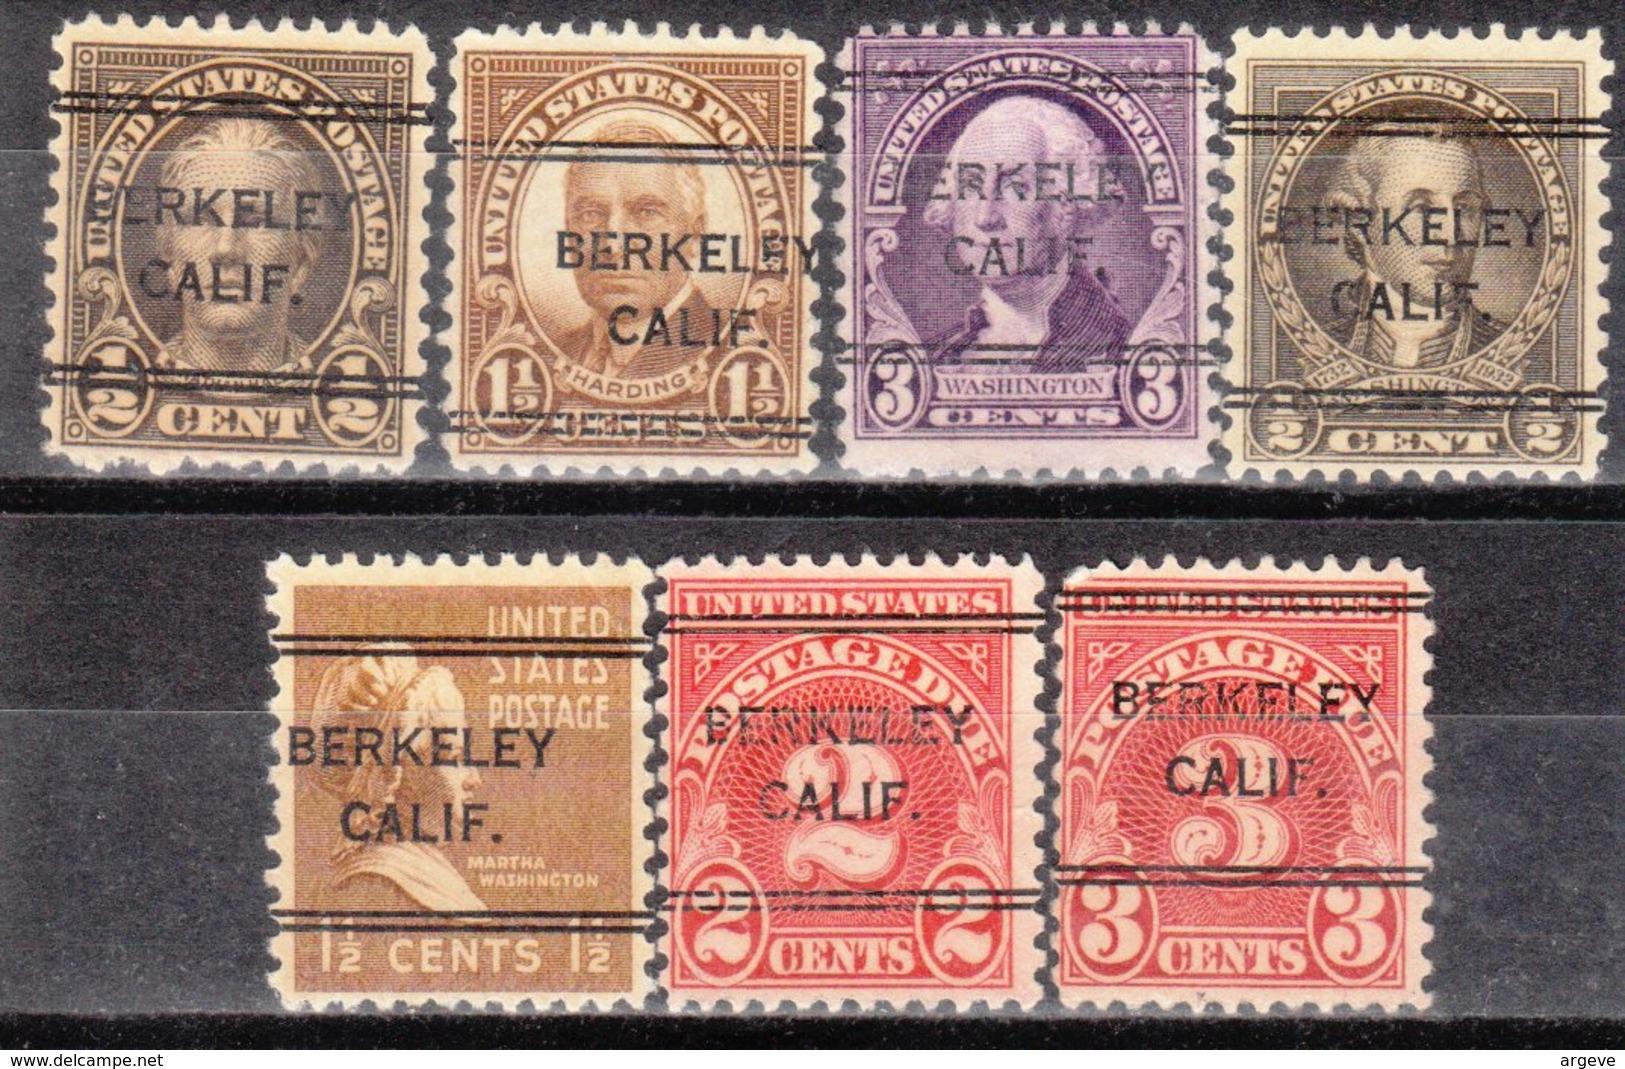 USA Precancel Vorausentwertung Preo, Locals California, Berkeley 243, 7 Diff. Perf. 11x10 1/2 - Etats-Unis